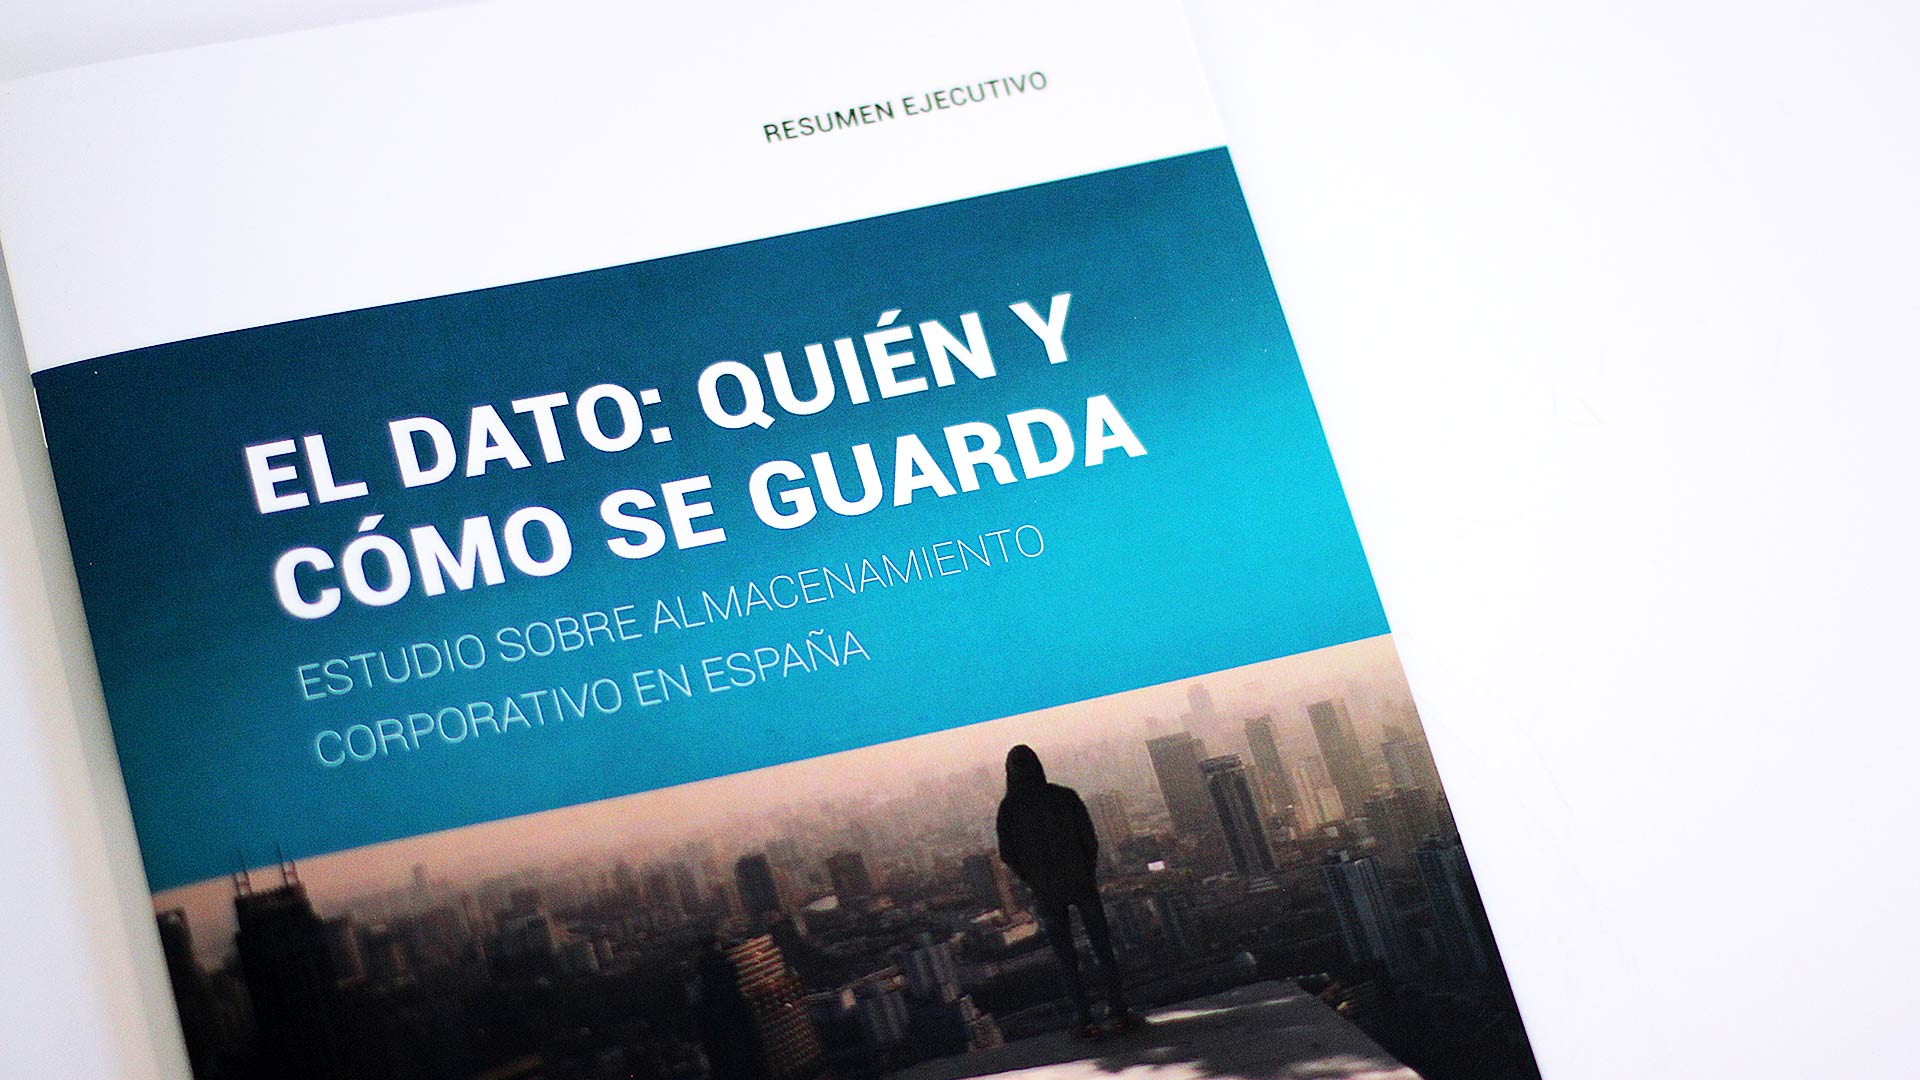 netapp-mediacloud-content-marketing-informe-resumen-ejecutivo-ebook-2017-08